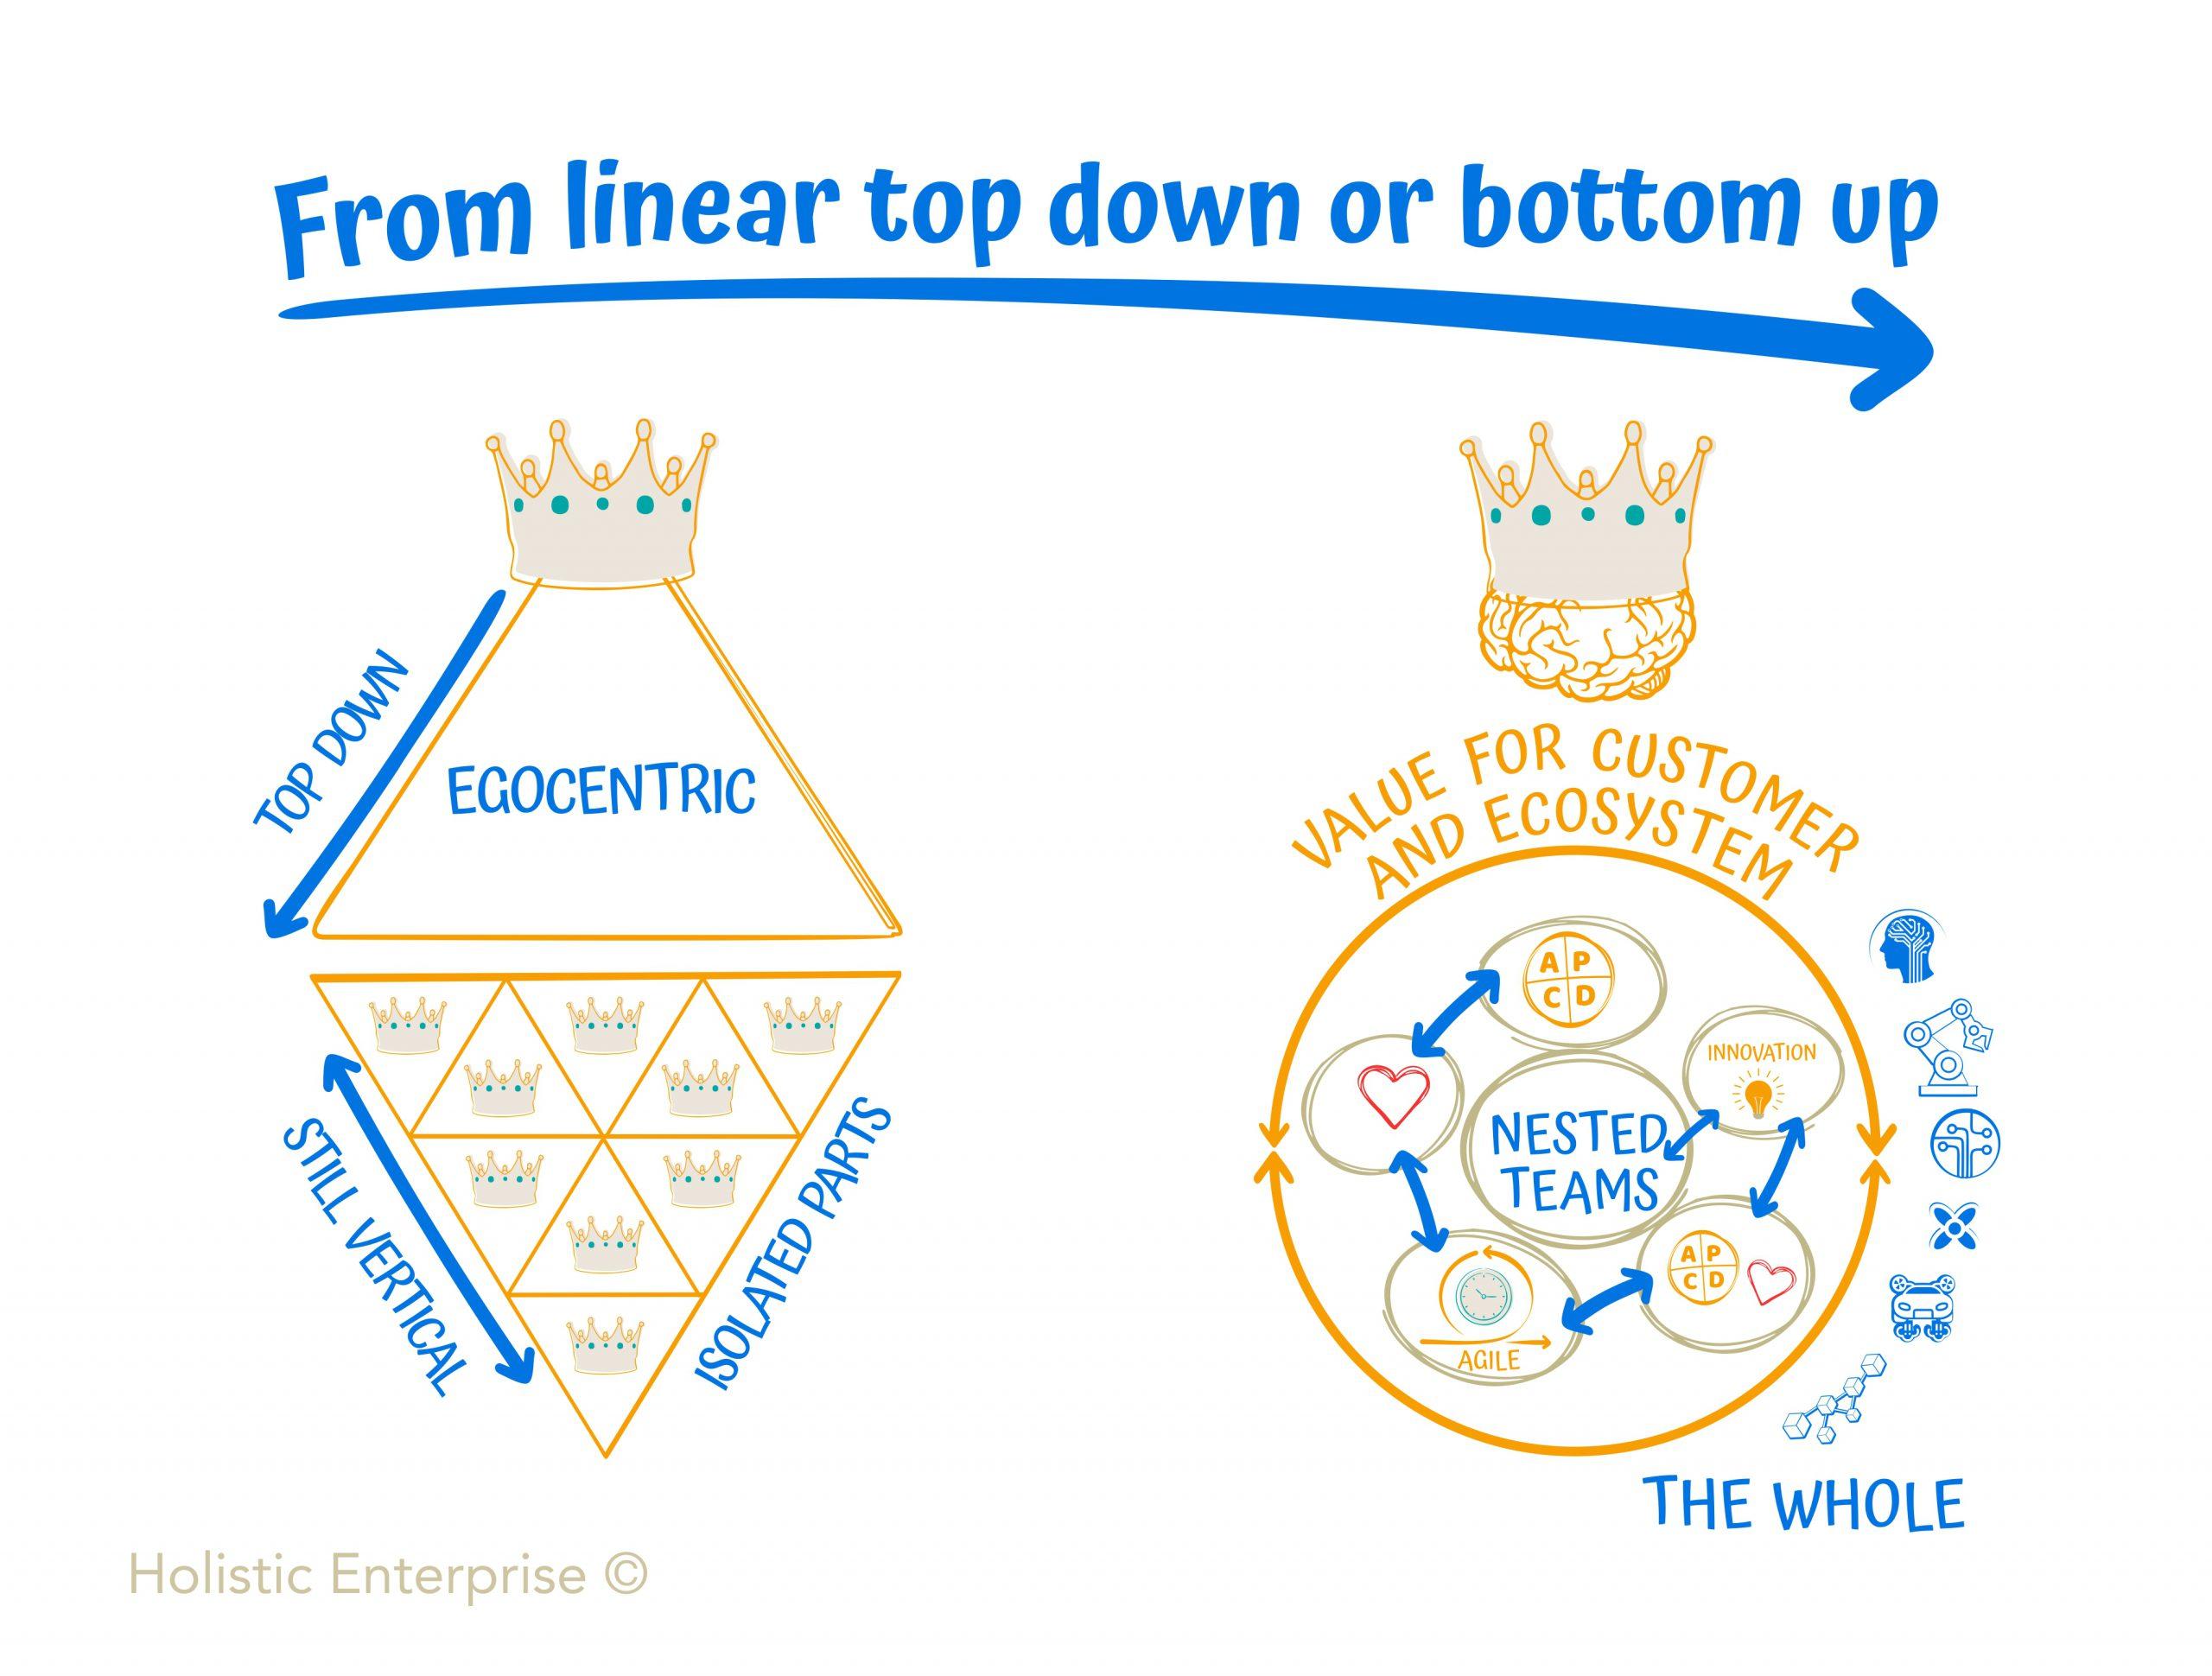 Holistic Enterprise CEO business performance strategy